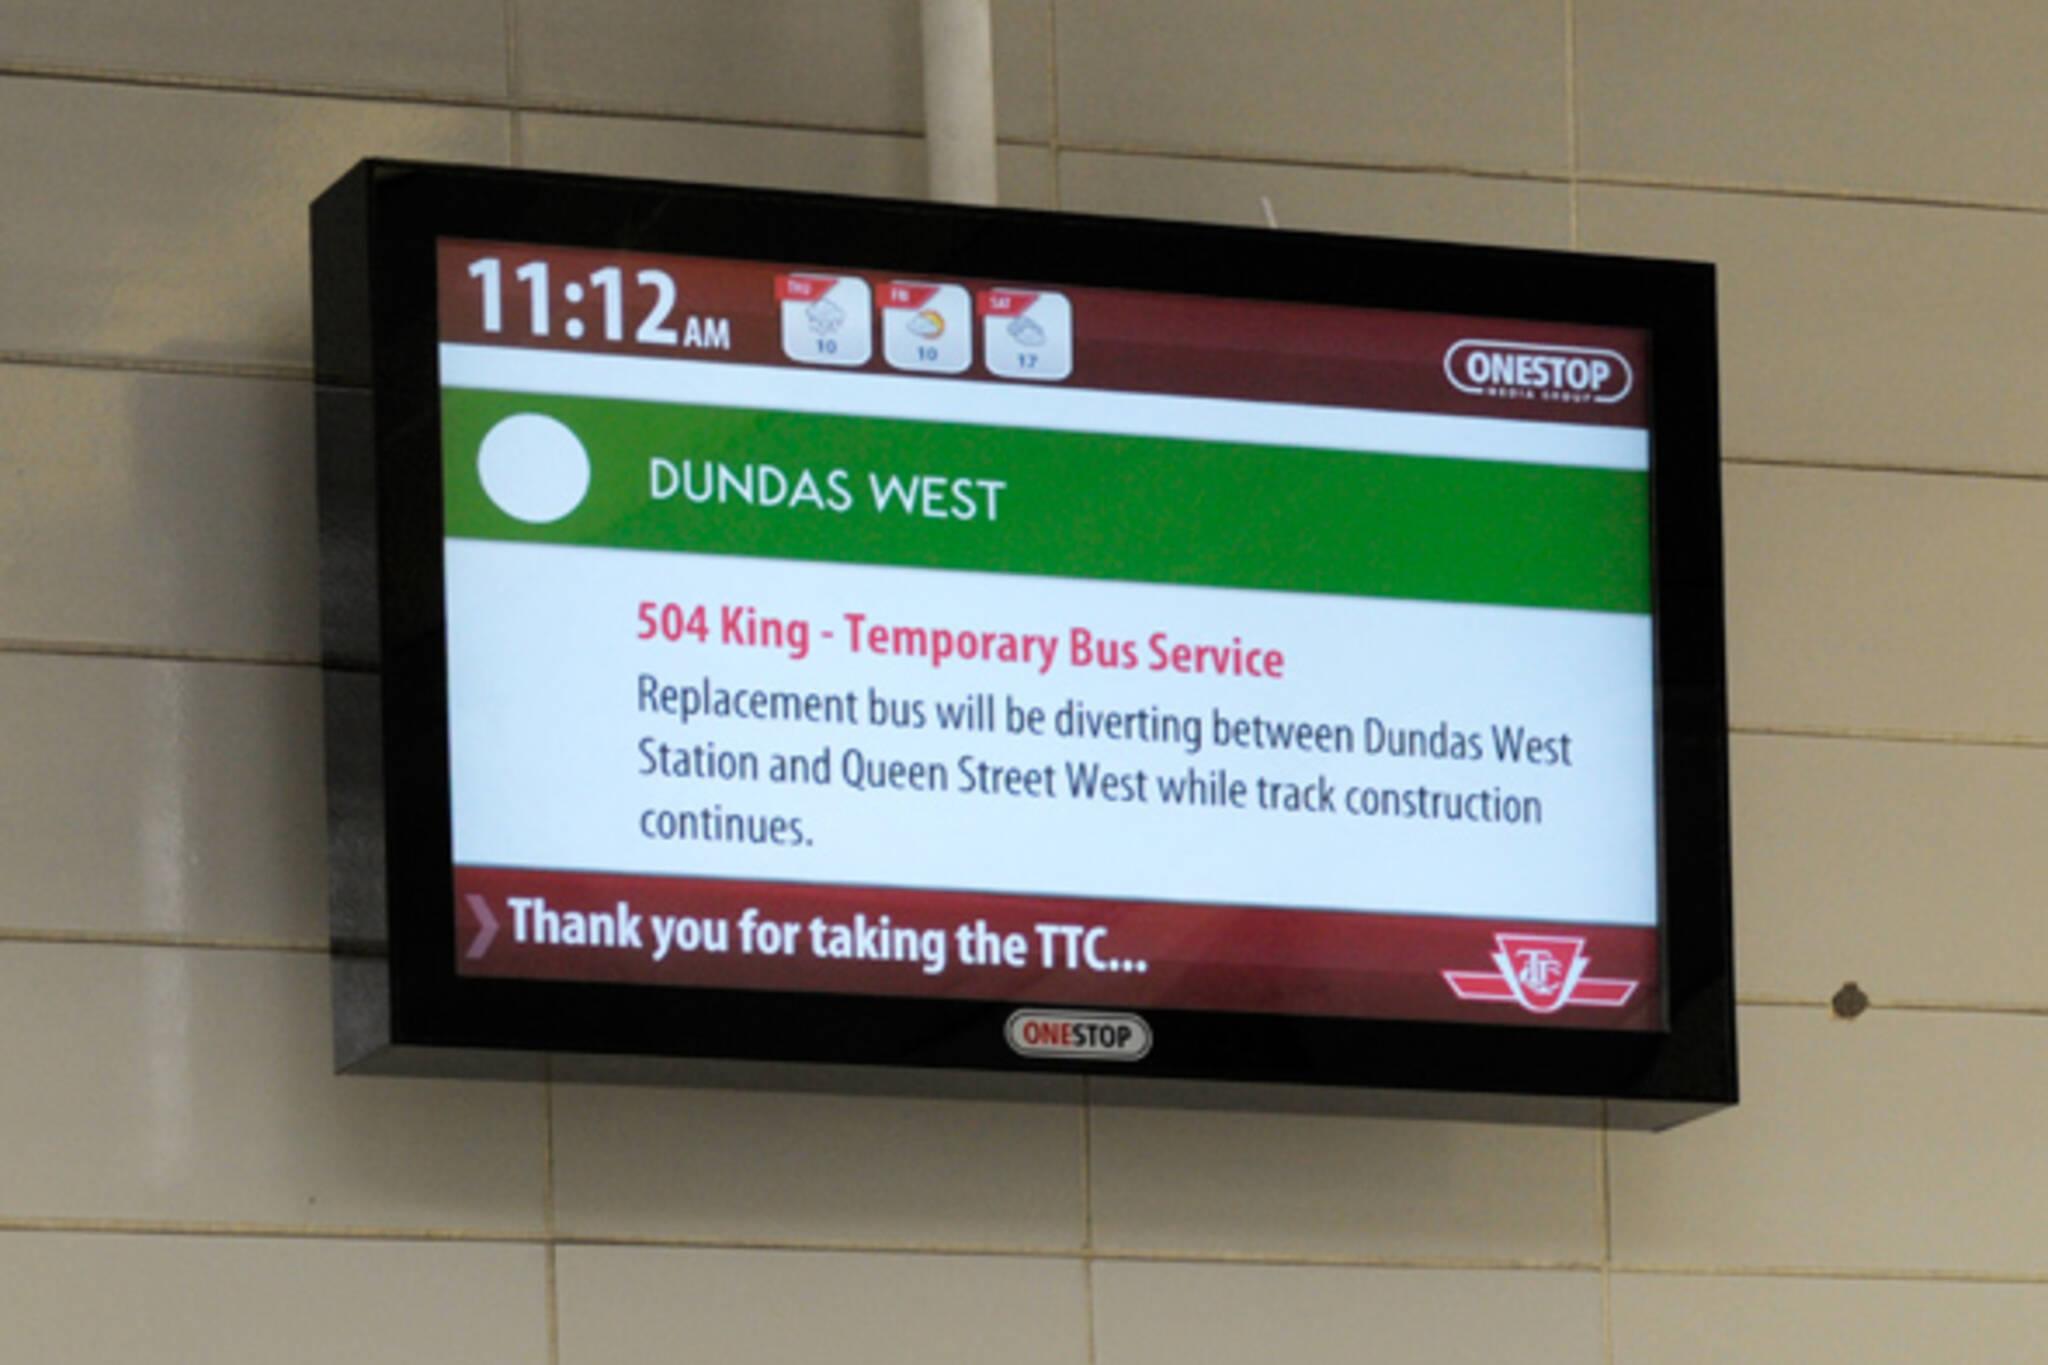 TTC Subway Information Screen